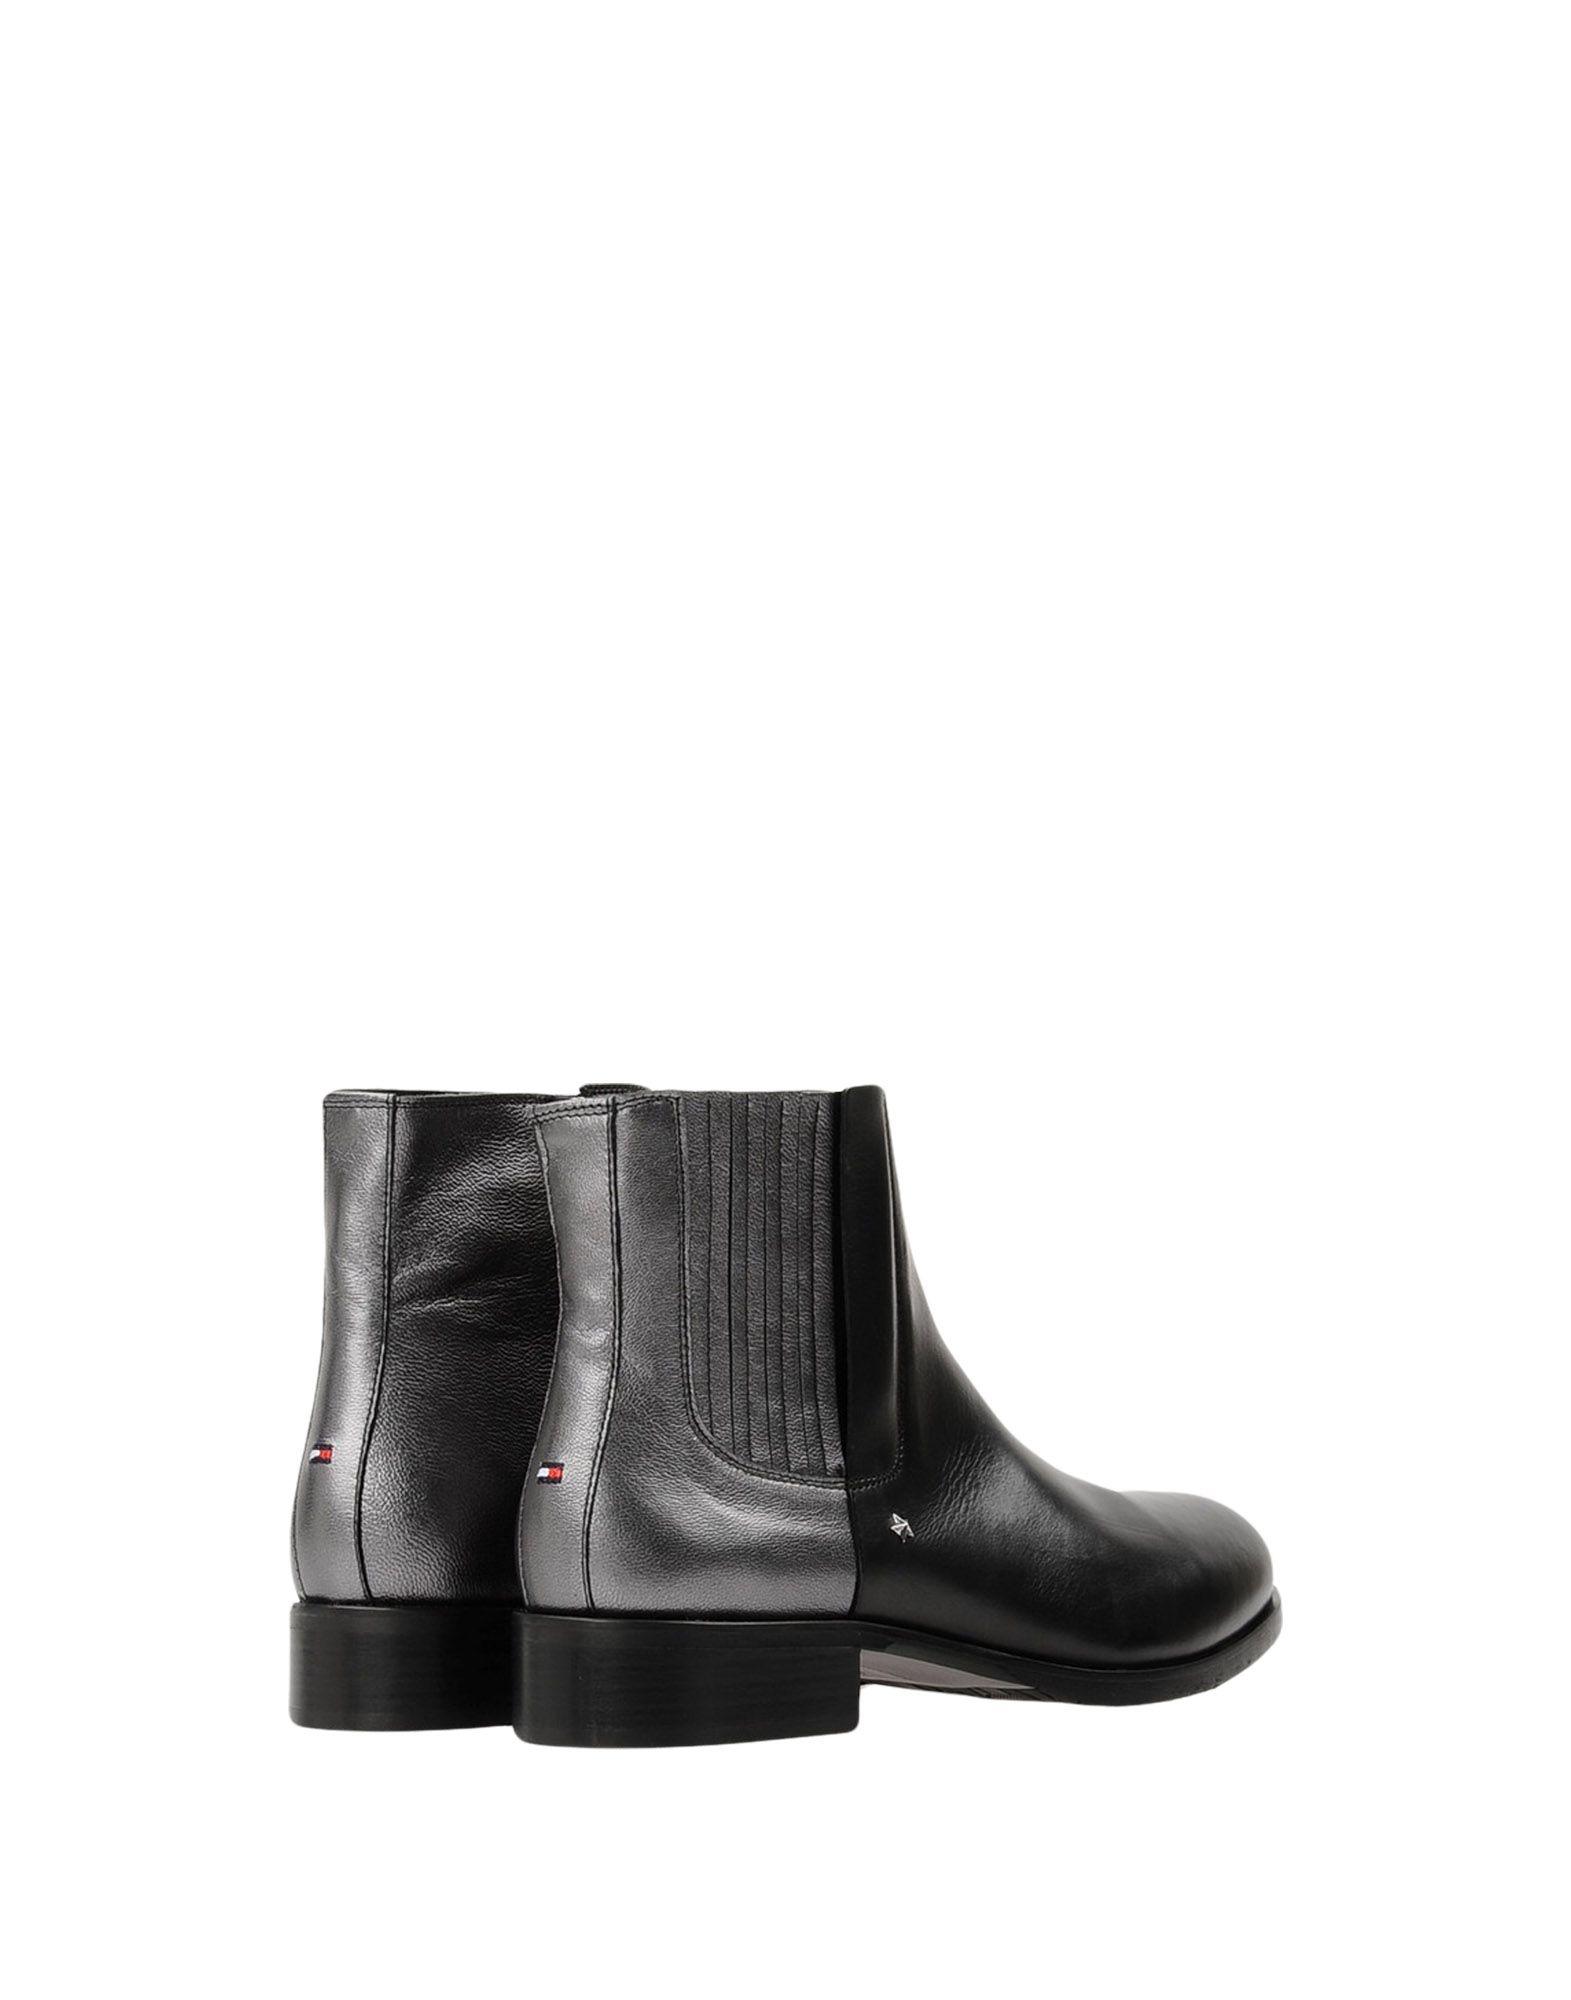 Stilvolle Chelsea billige Schuhe Tommy Hilfiger Chelsea Stilvolle Stiefel Damen  11417565FM 0ab050